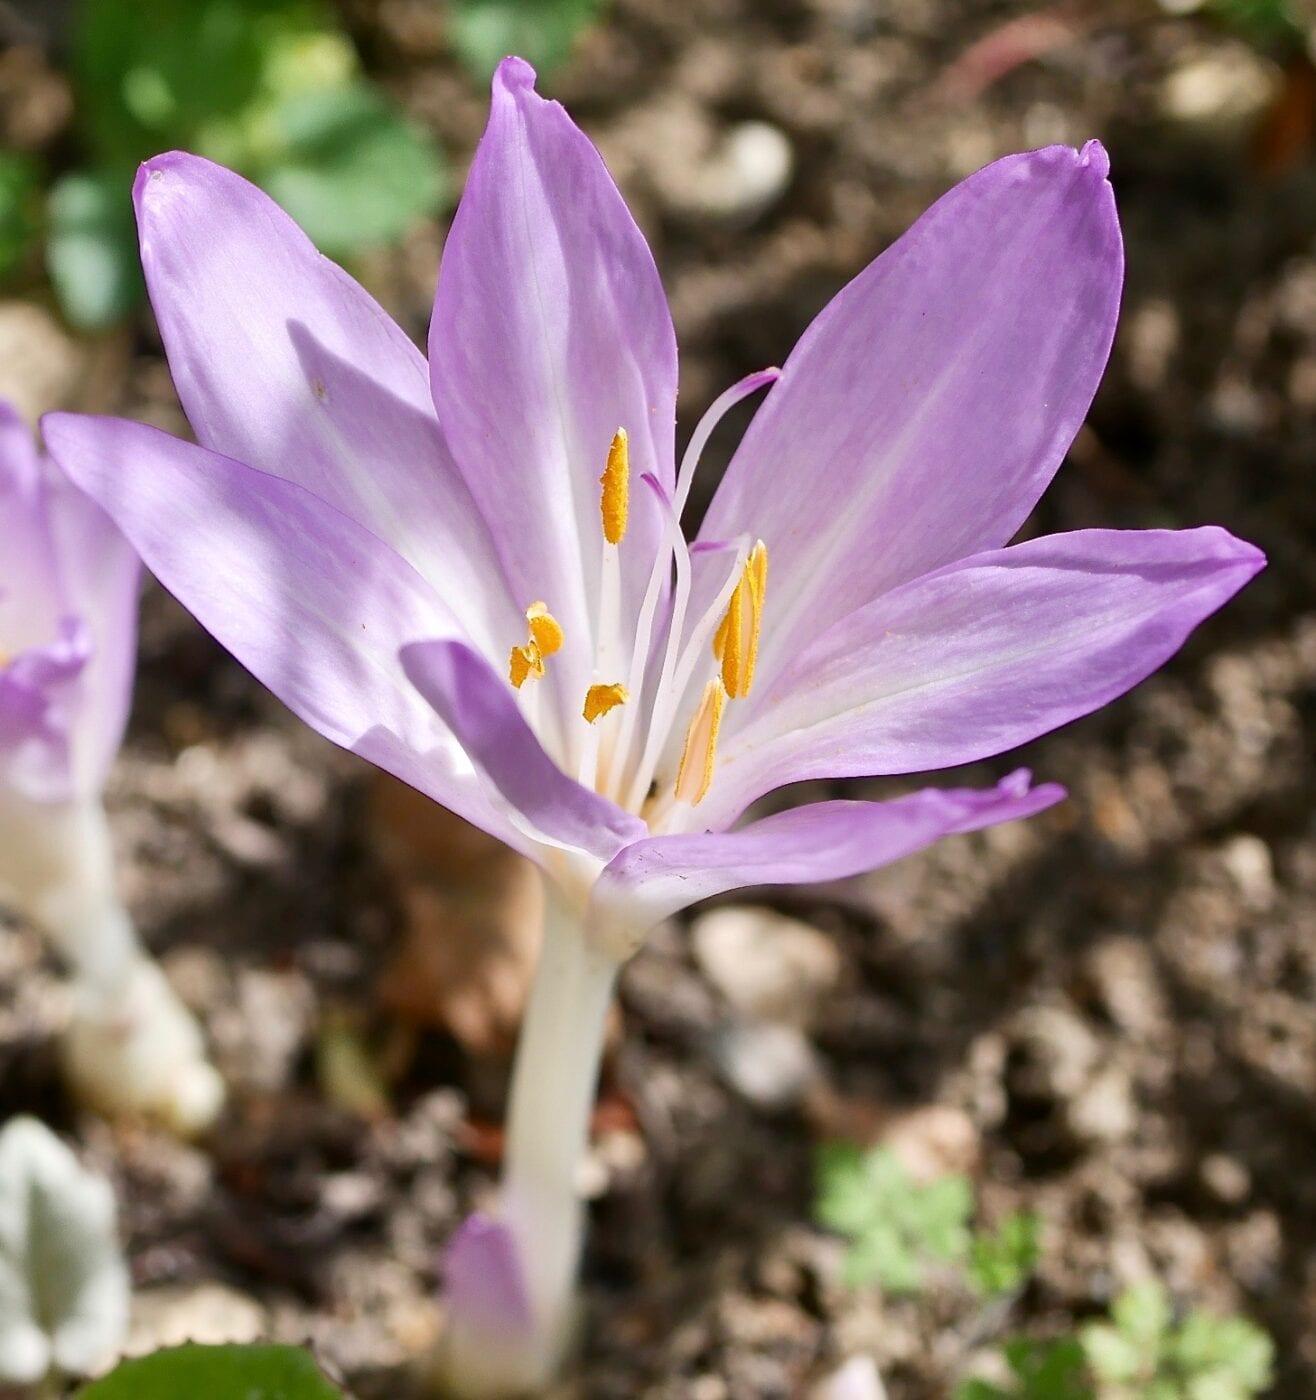 meadow saffron flower